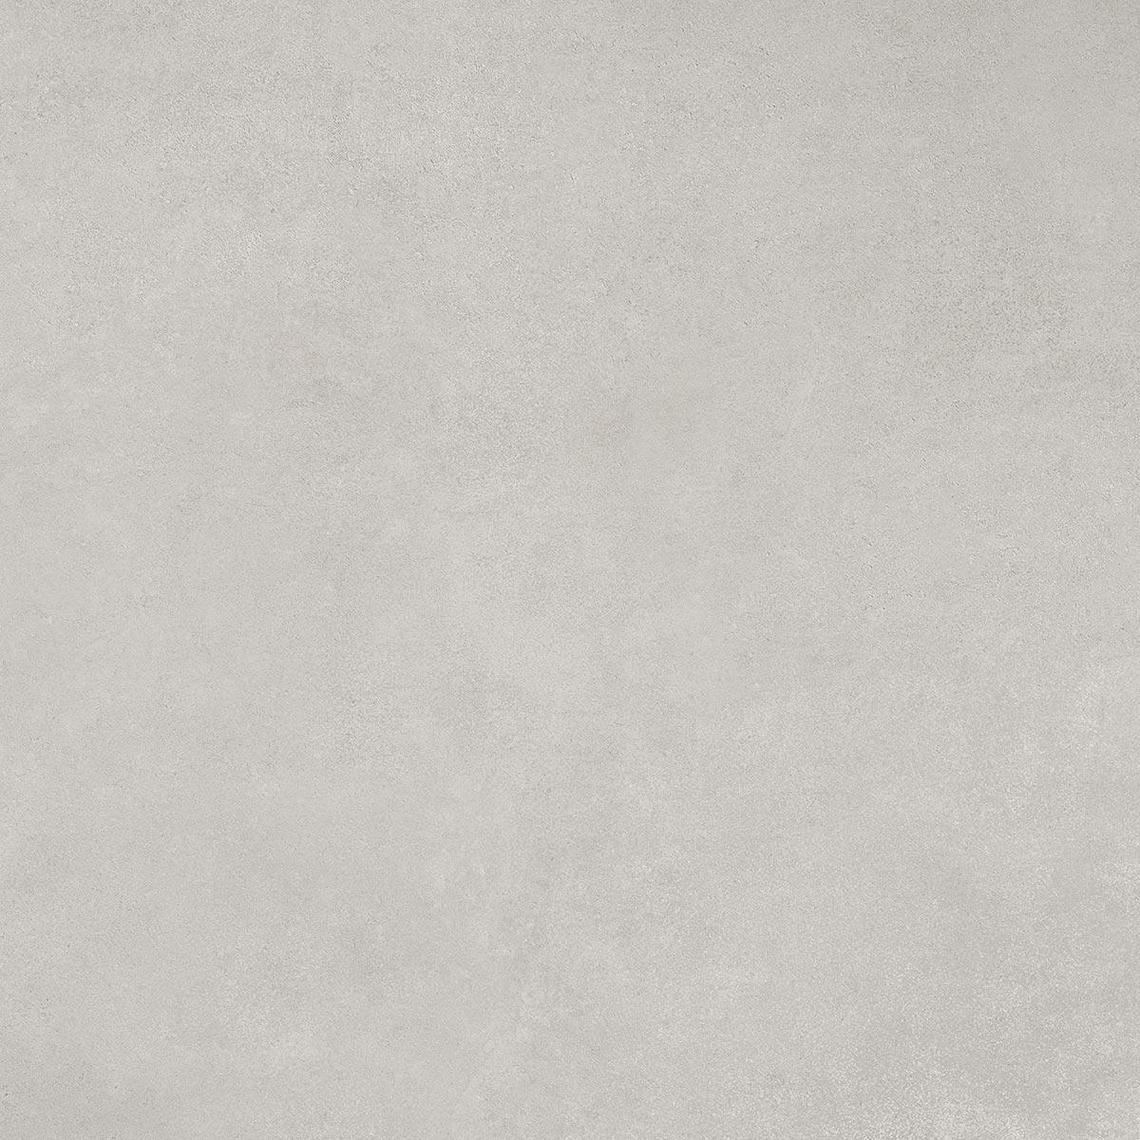 NUVOLE GREY MATT RECT. (59,5x59,5)